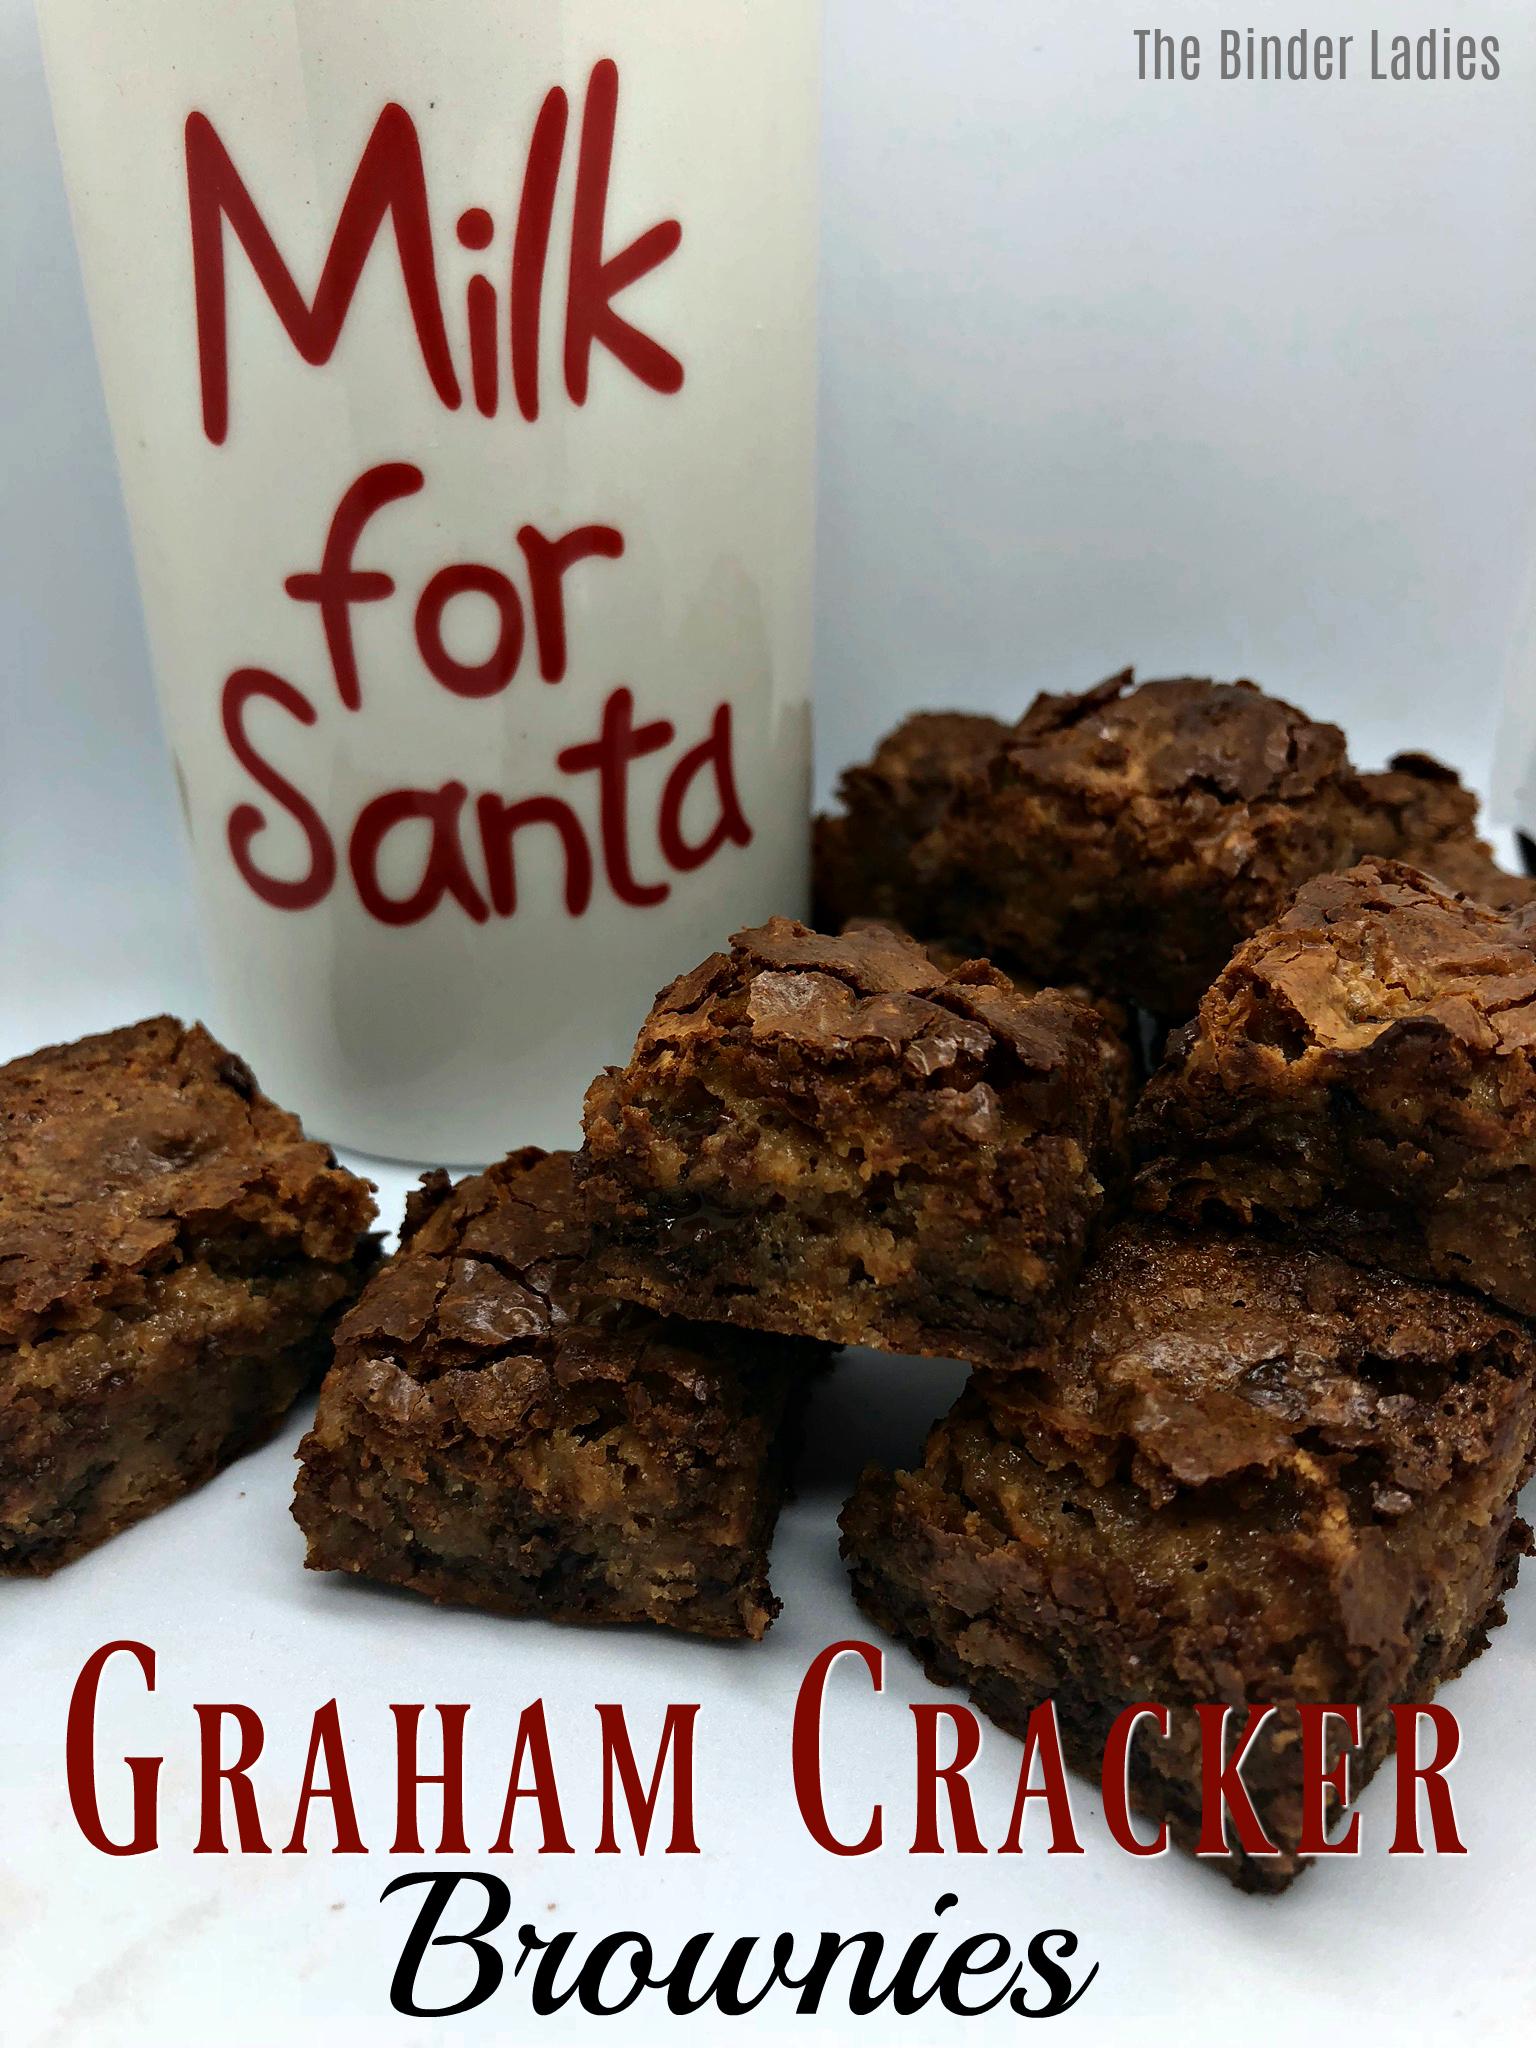 Graham Cracker Brownies Recipe